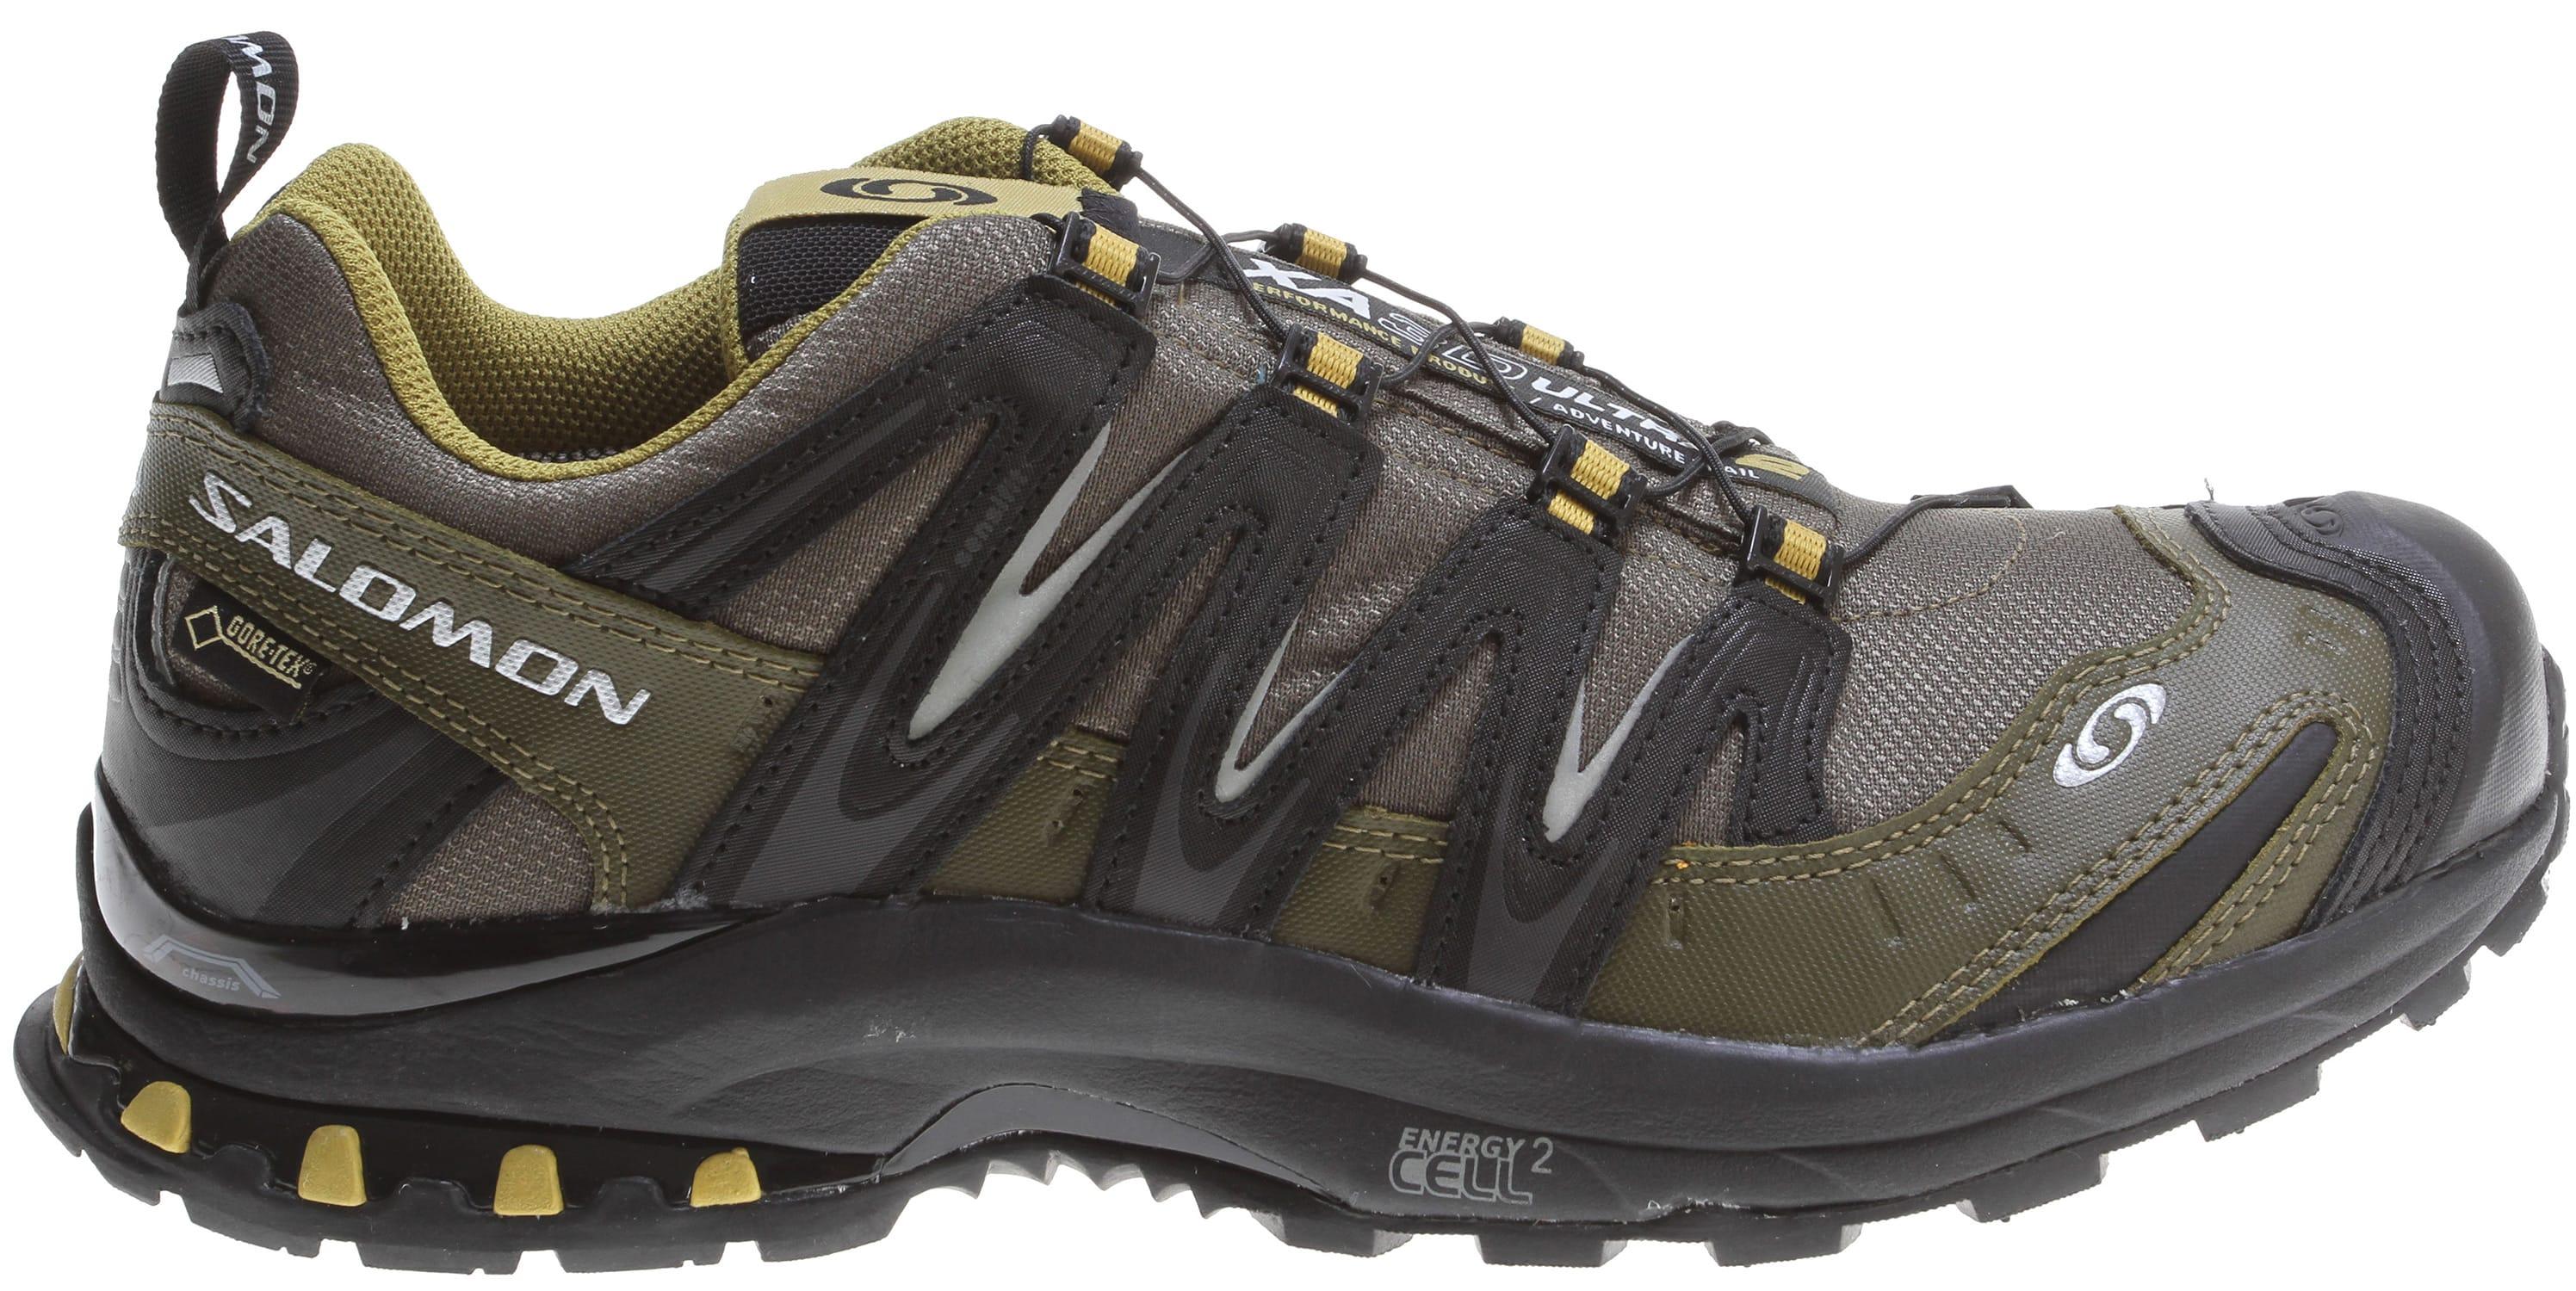 Salomon XA Pro 3D Ultra 2 GTX Trail Running Shoes